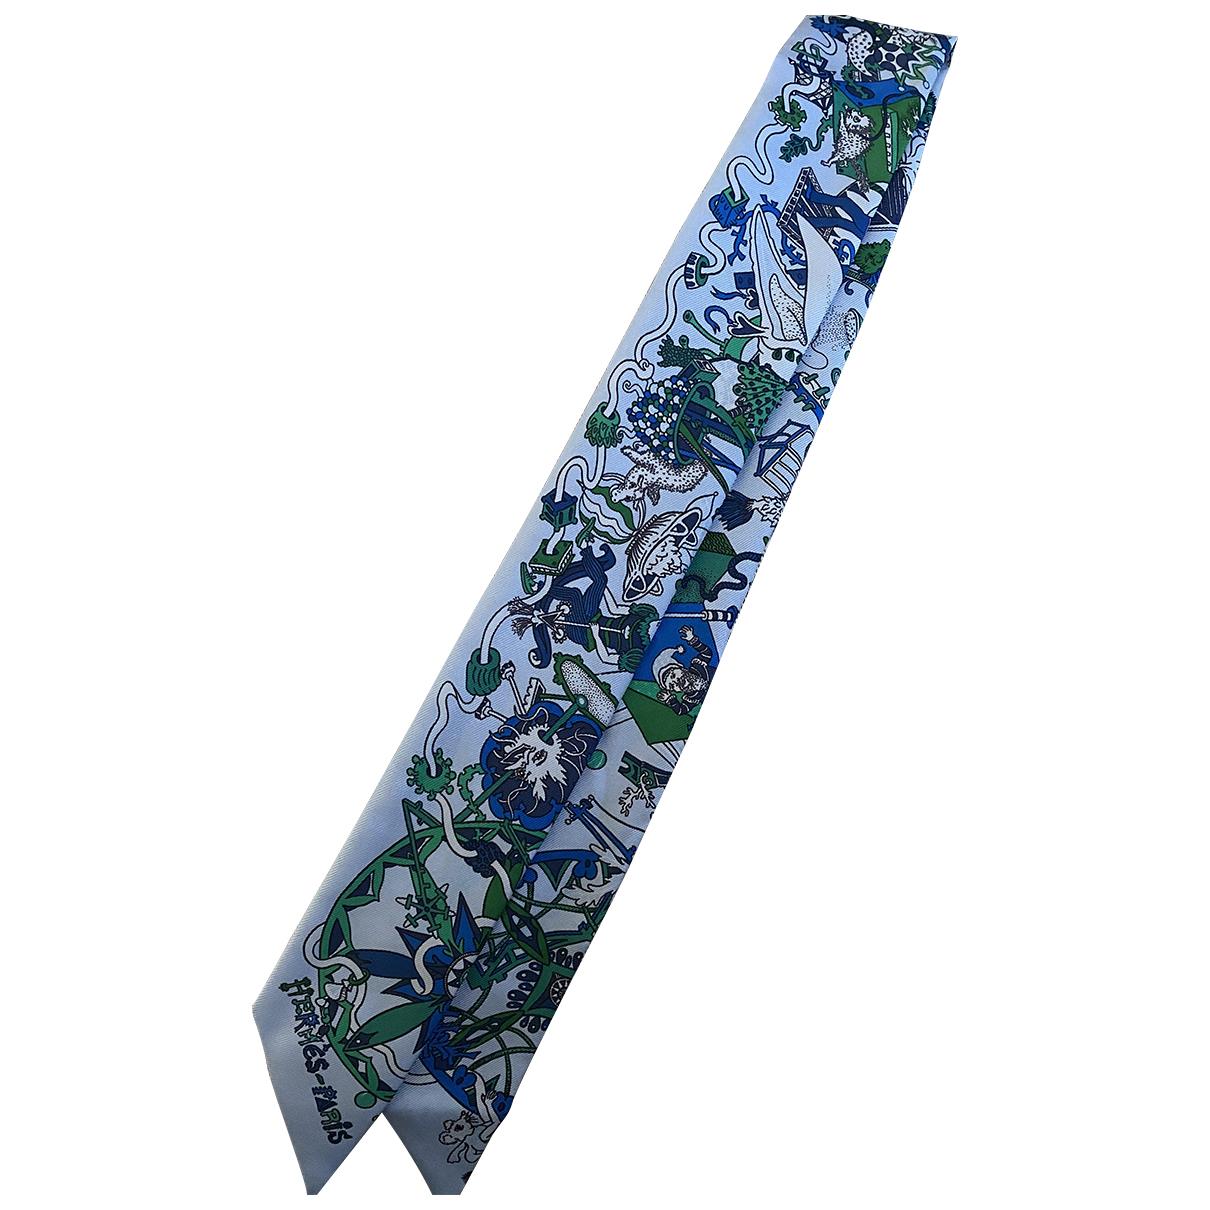 Hermes Twilly 86 Schal in  Blau Seide